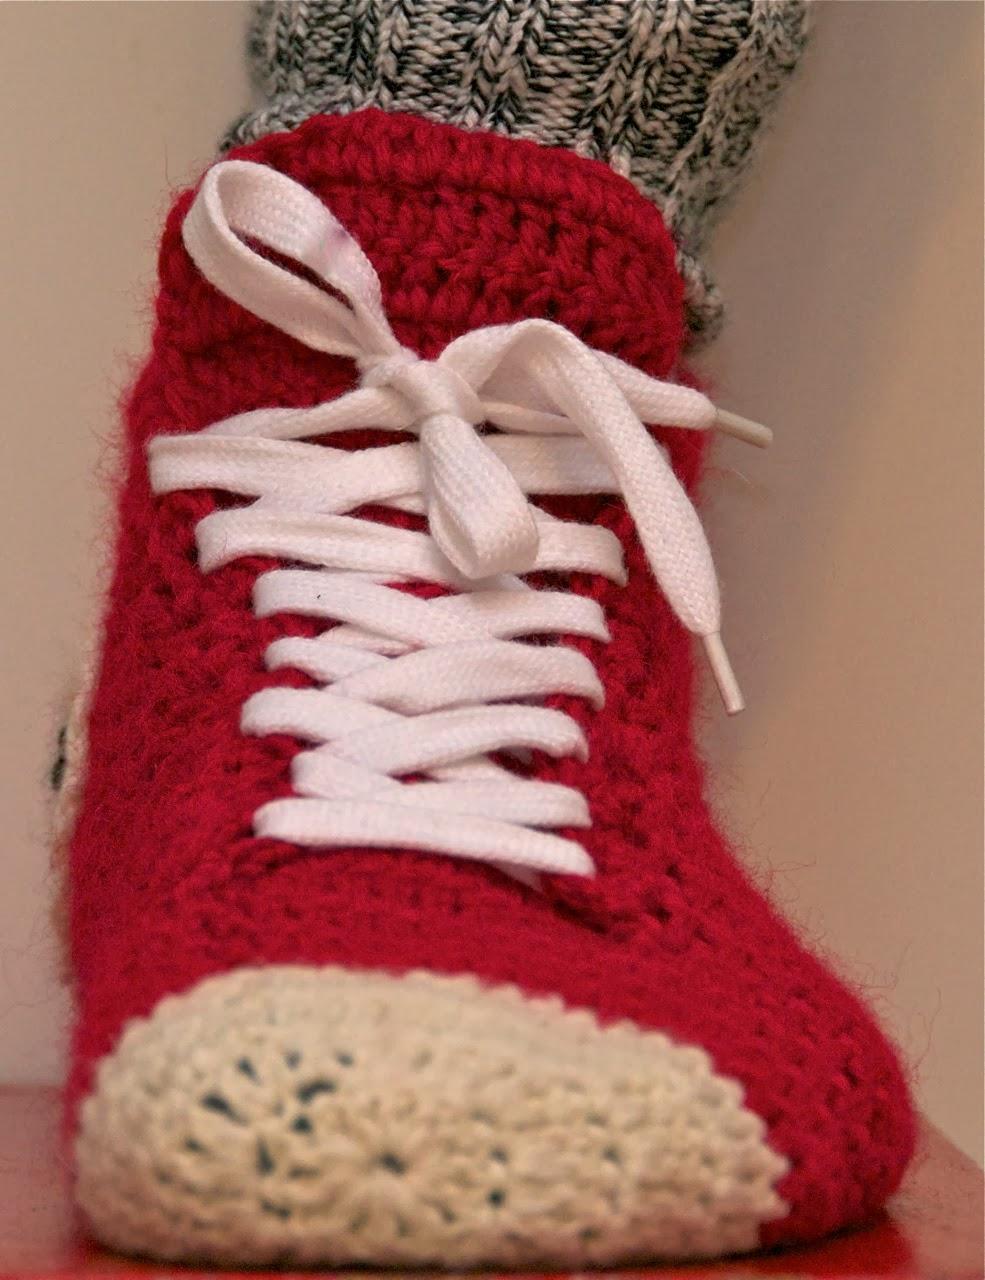 Crochet Pattern For Converse Slippers : Mun Tekem?!: My Crochet Converse Slippers - English ...